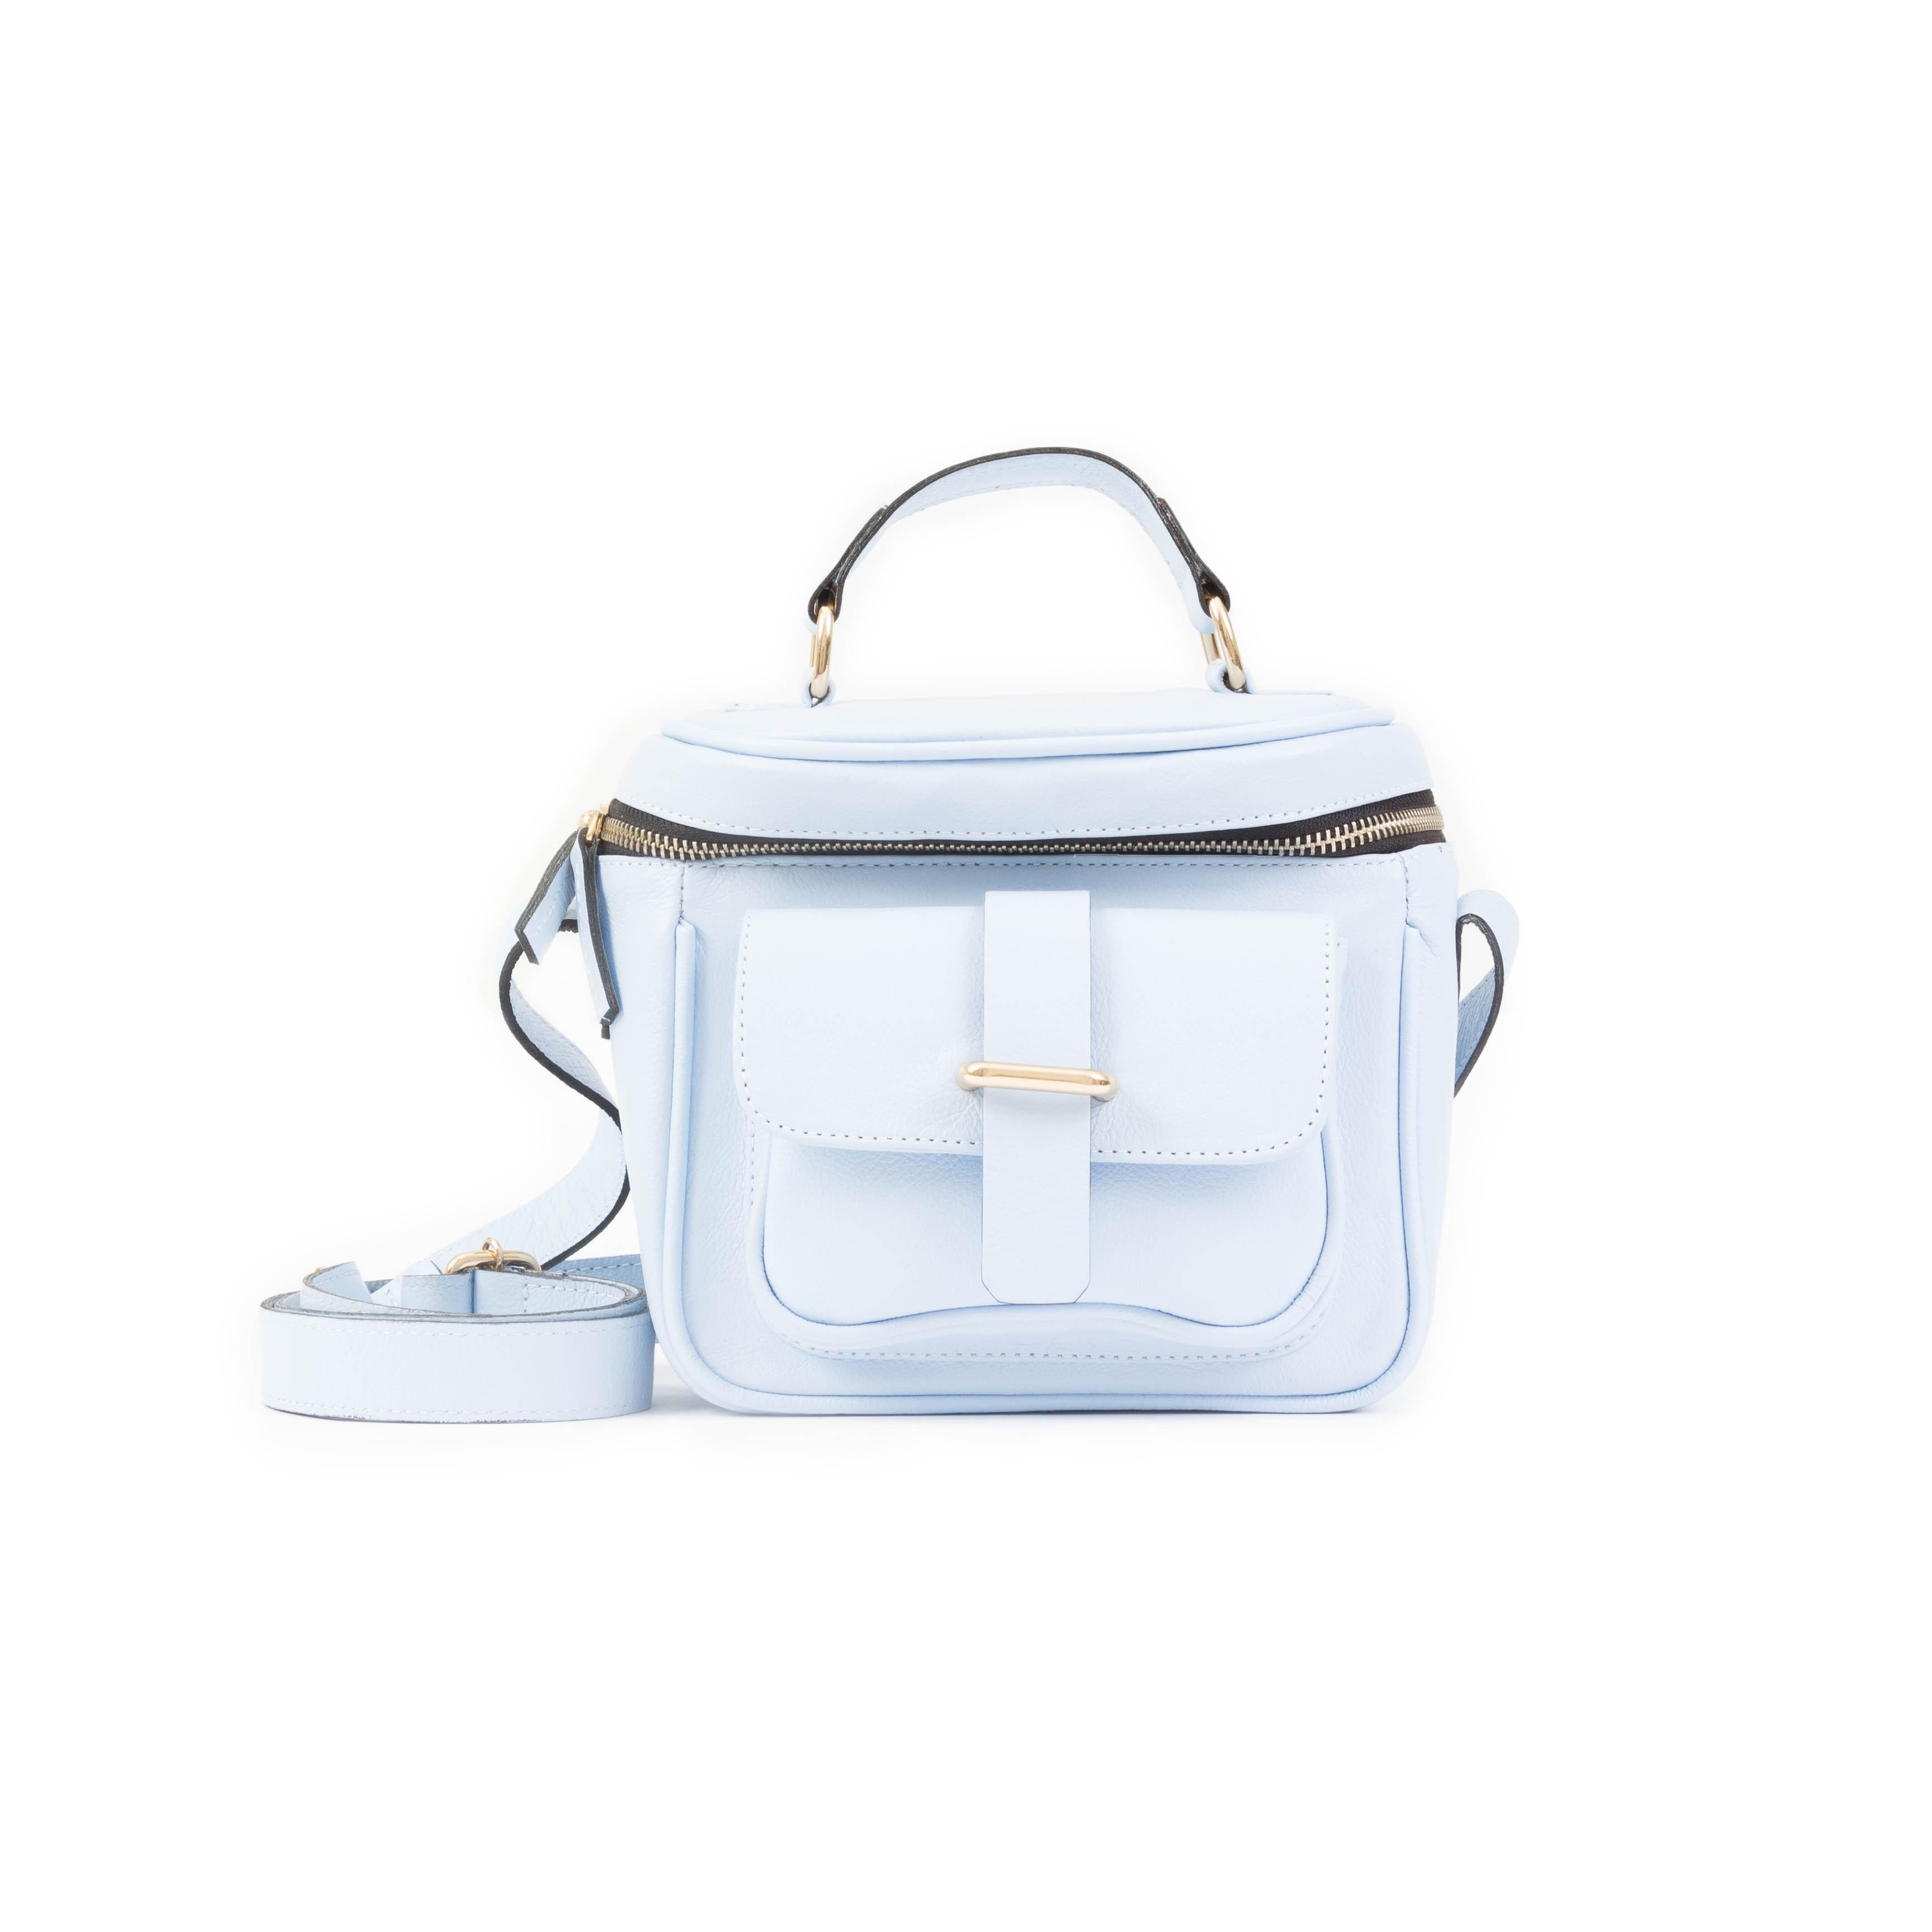 1425ccf1a4d8e Bolsa de Couro Farah P Azul Nuvem - Adô Atelier